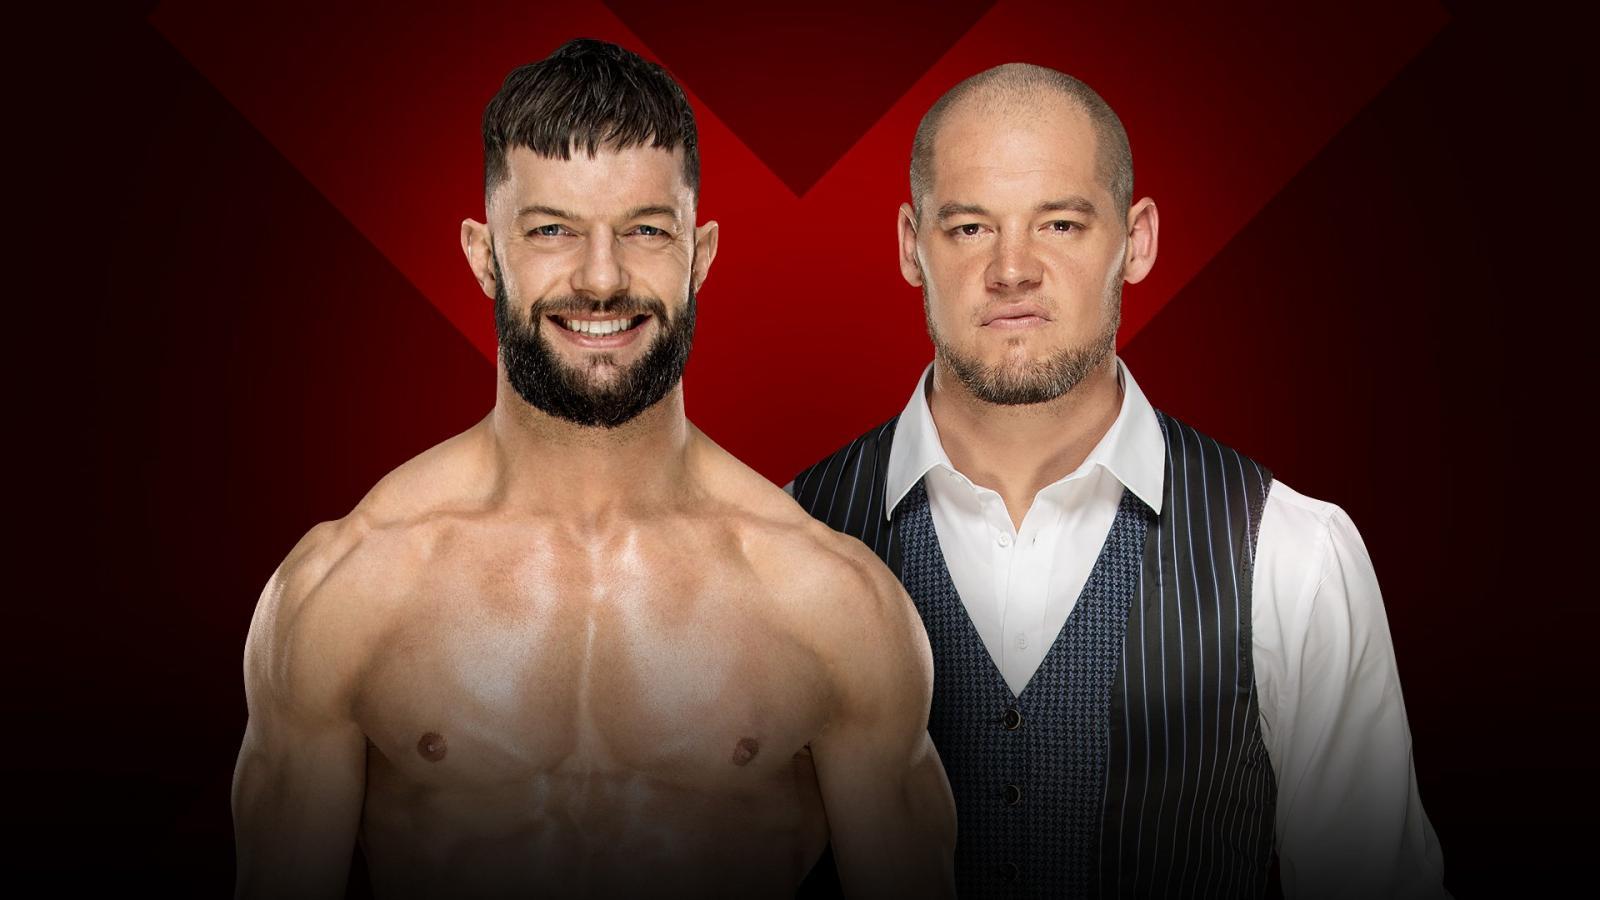 Матч Финна Бэлора и Бэрона Корбина официально анонсирован на Extreme Rules 2018